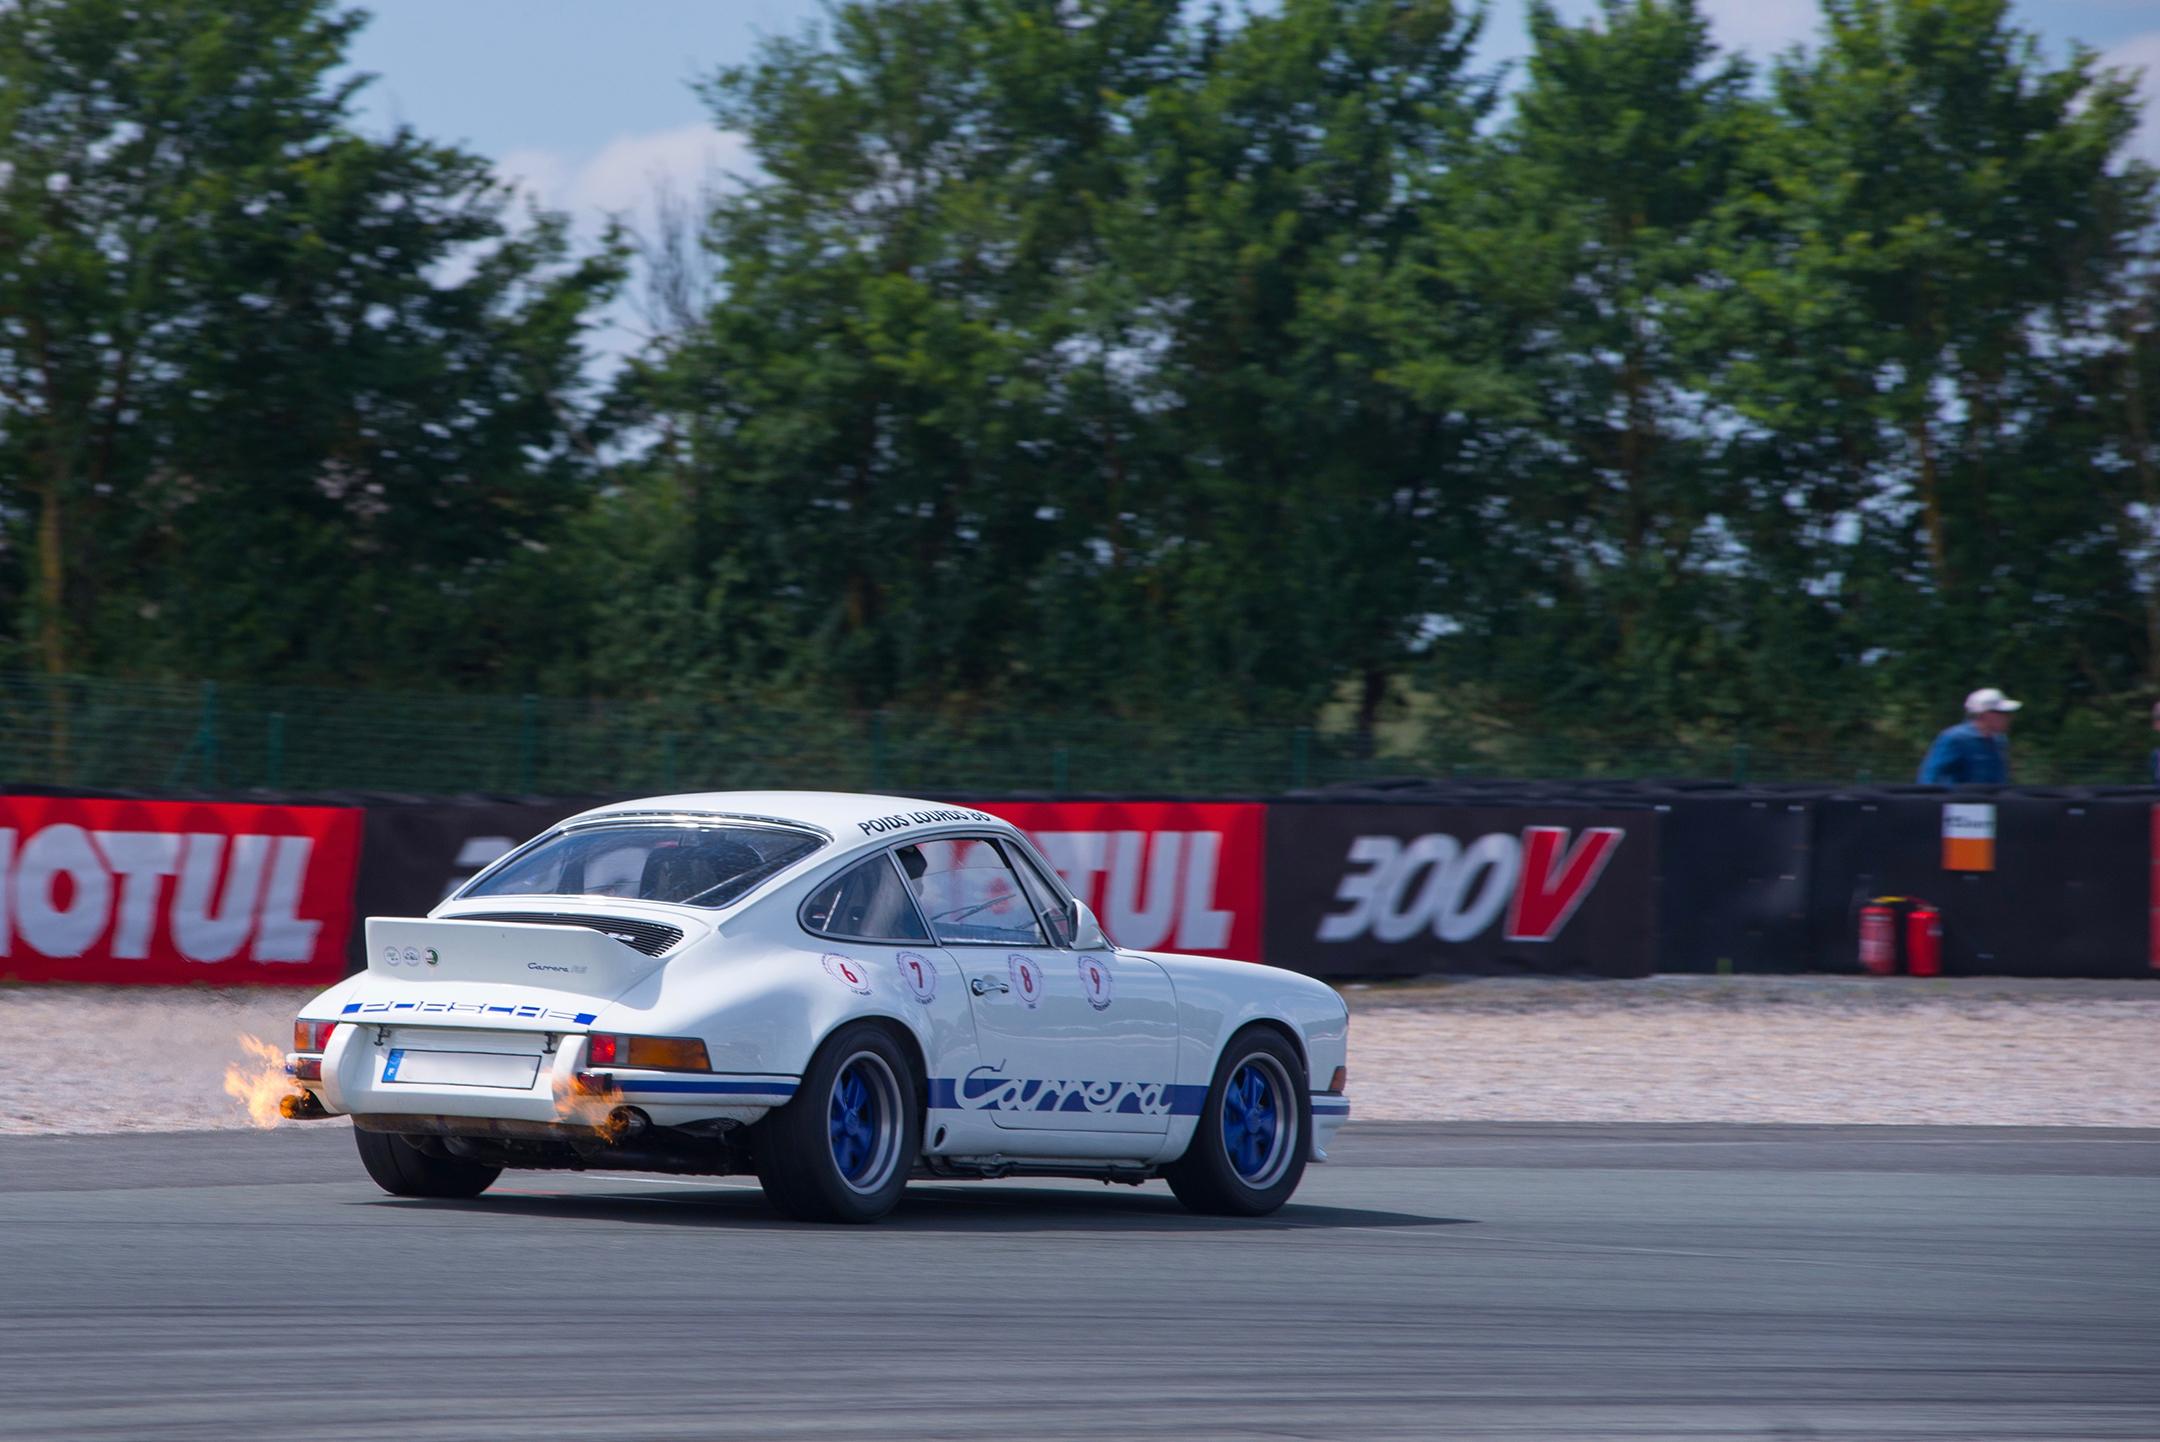 Porsche 2.7 RS - Sport et Collection 2018 - photo Benjamin Rouland